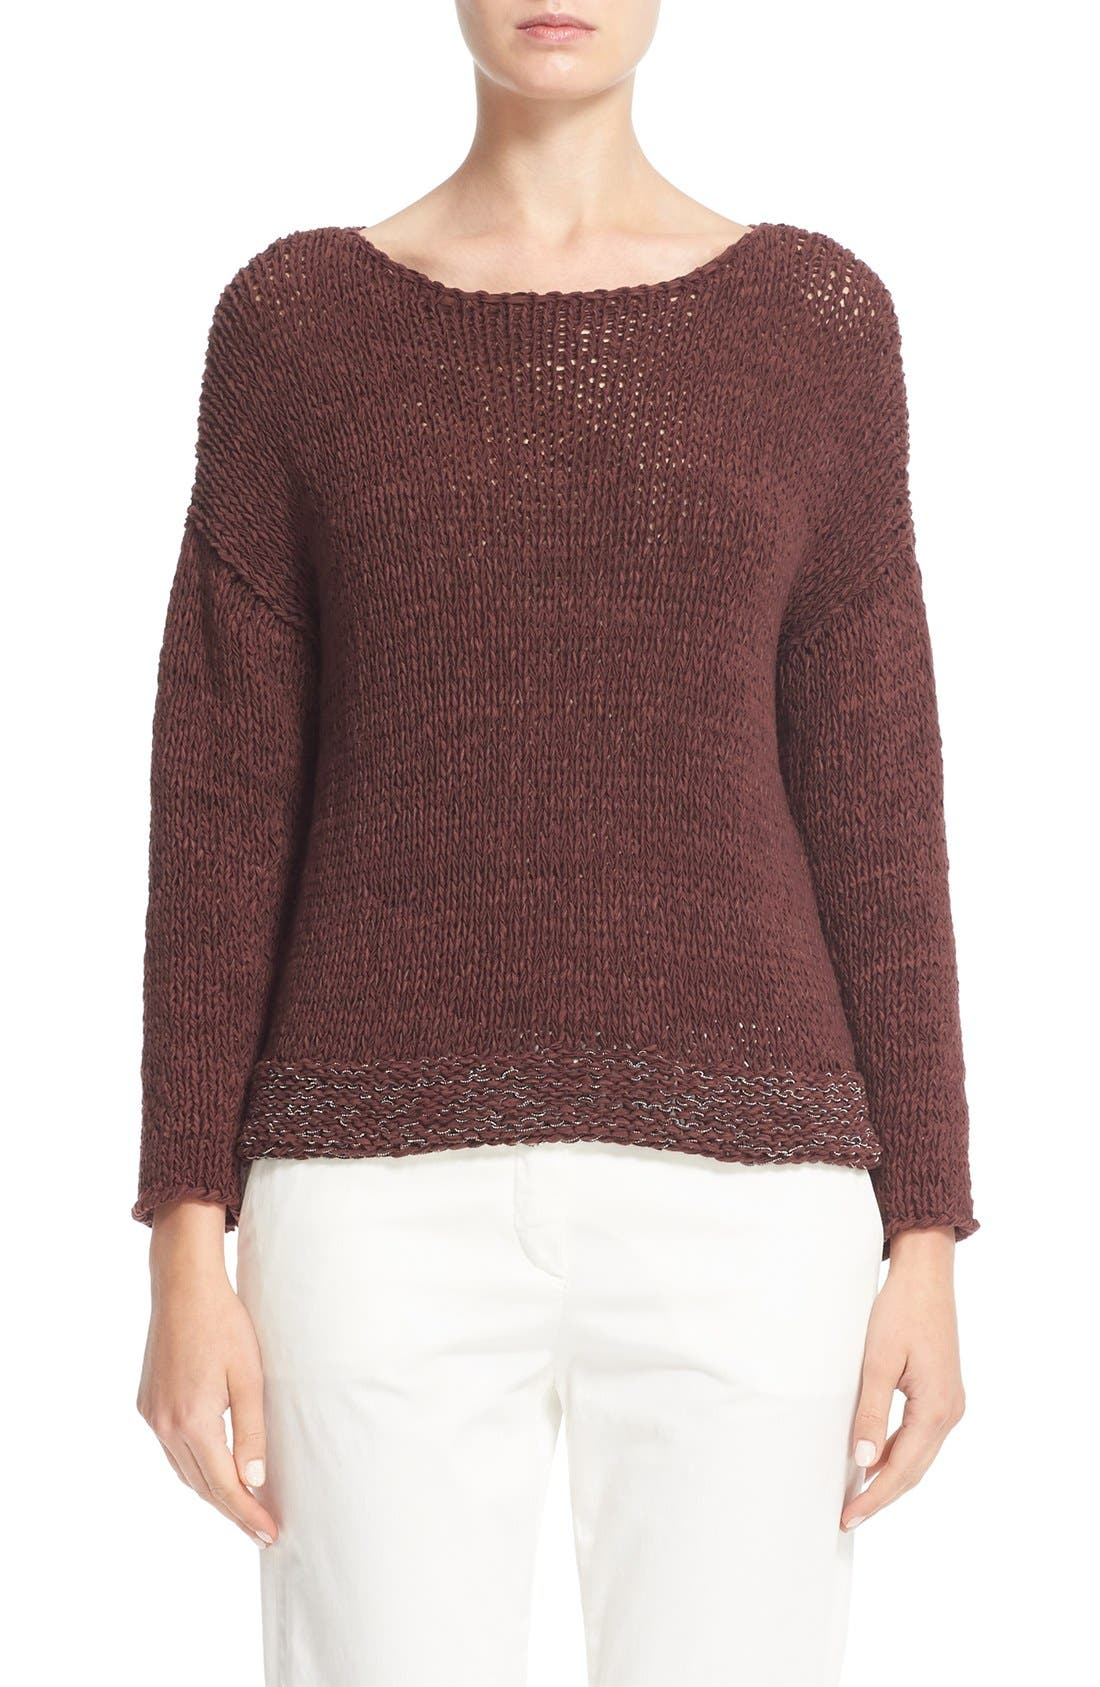 Main Image - Fabiana Filippi Mollini Trim Cotton Blend Sweater